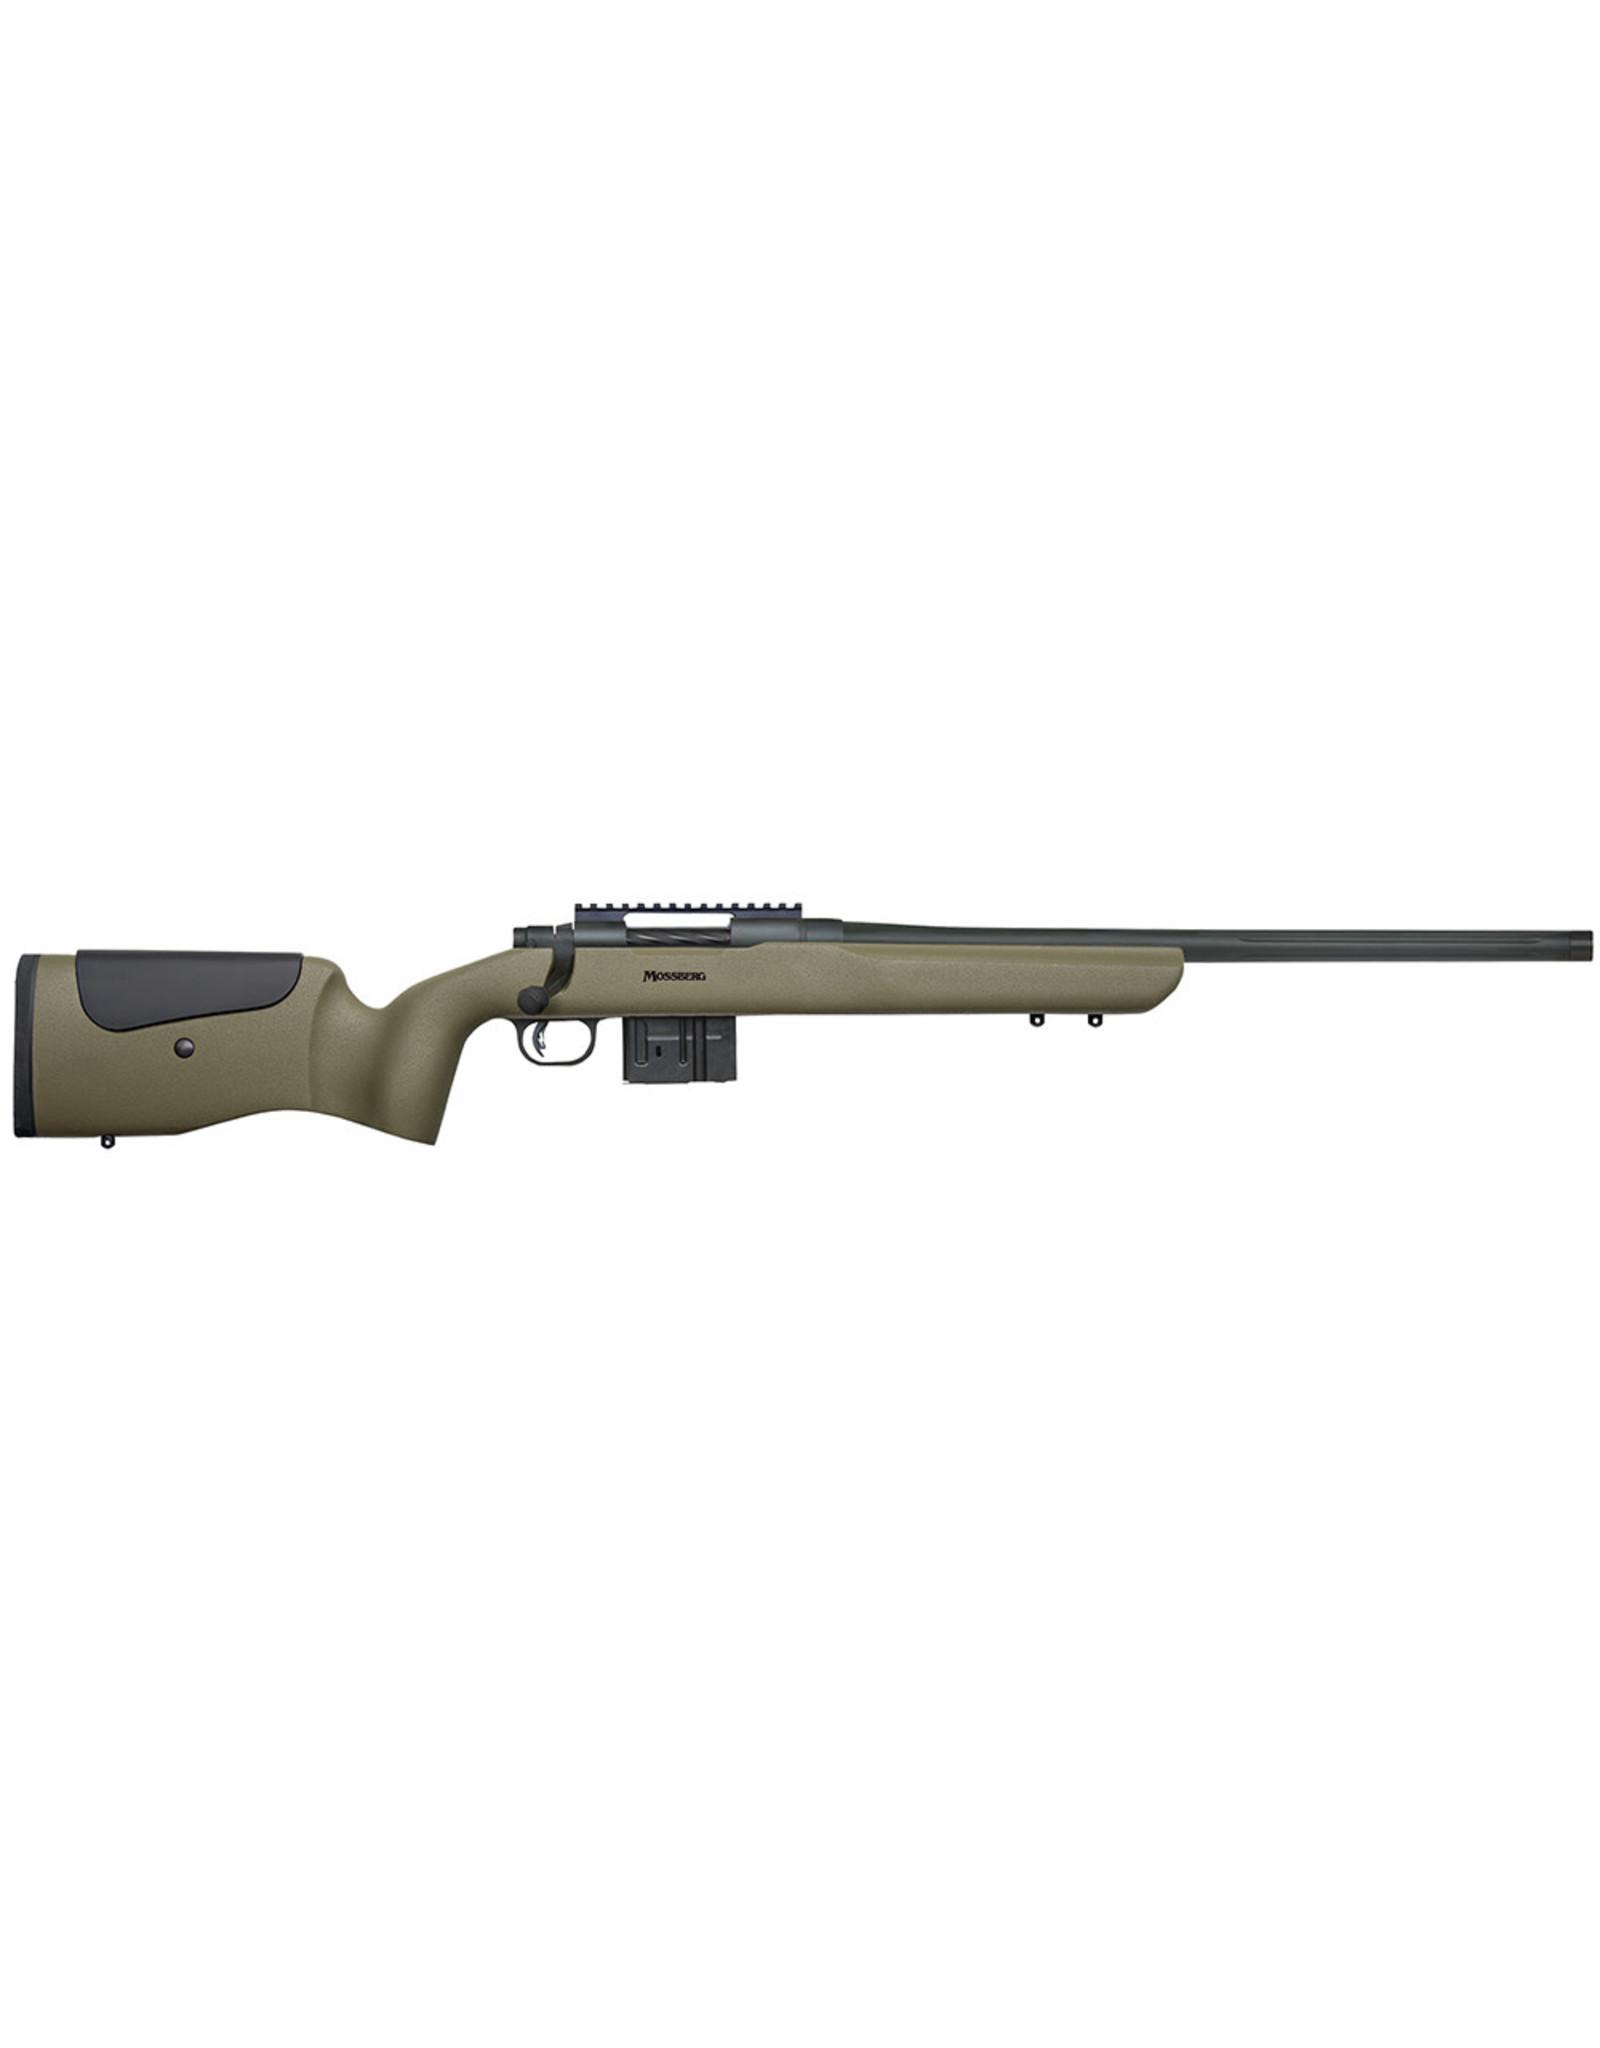 MOSSBERG Mossberg 27697 MVP LR Bolt Rifle 308 WIN, RH, 20 in, Blued, Syn